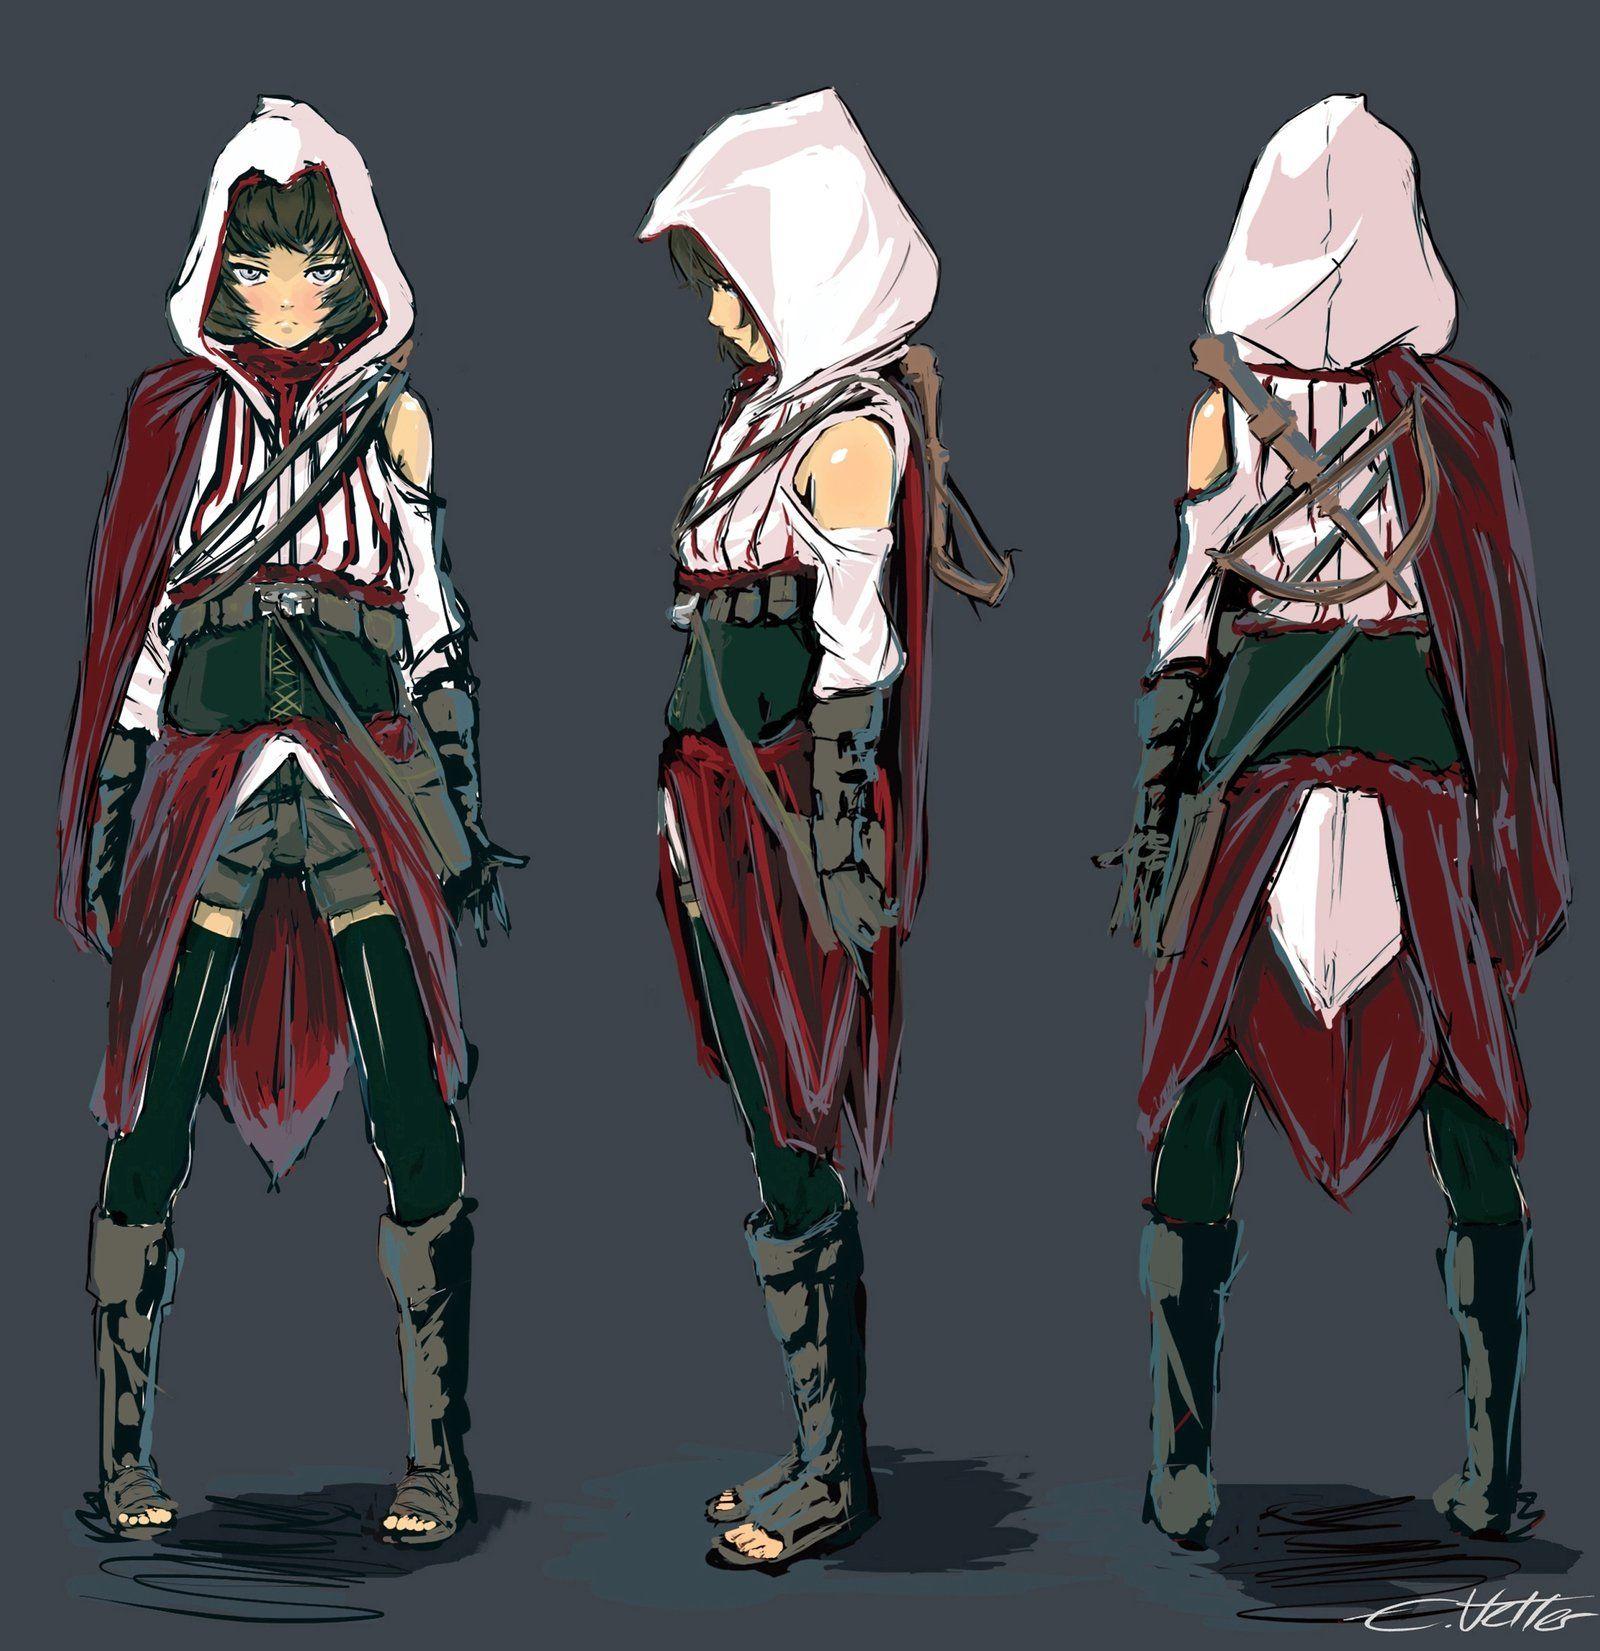 Female Assassin Female Assassin Anime Outfits Assassins Creed Female